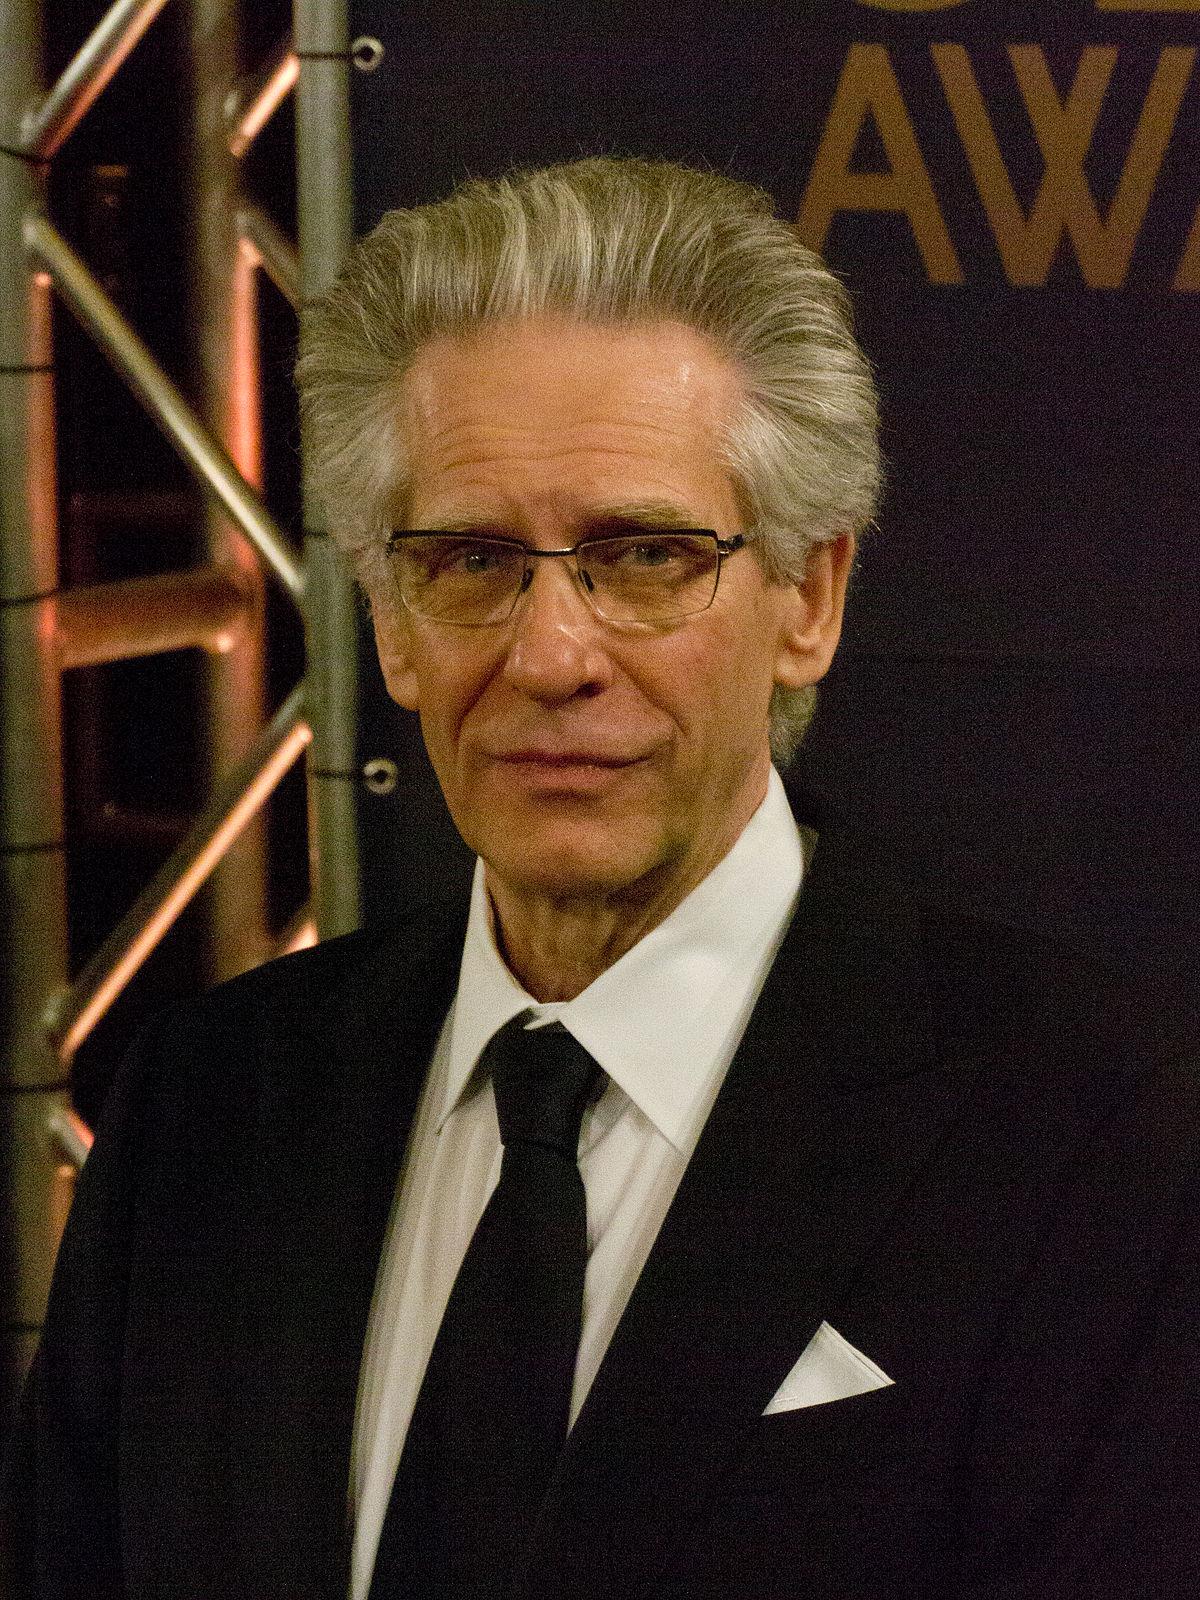 David Cronenberg - film director, screenwriter. The best films of David Cronenberg 11